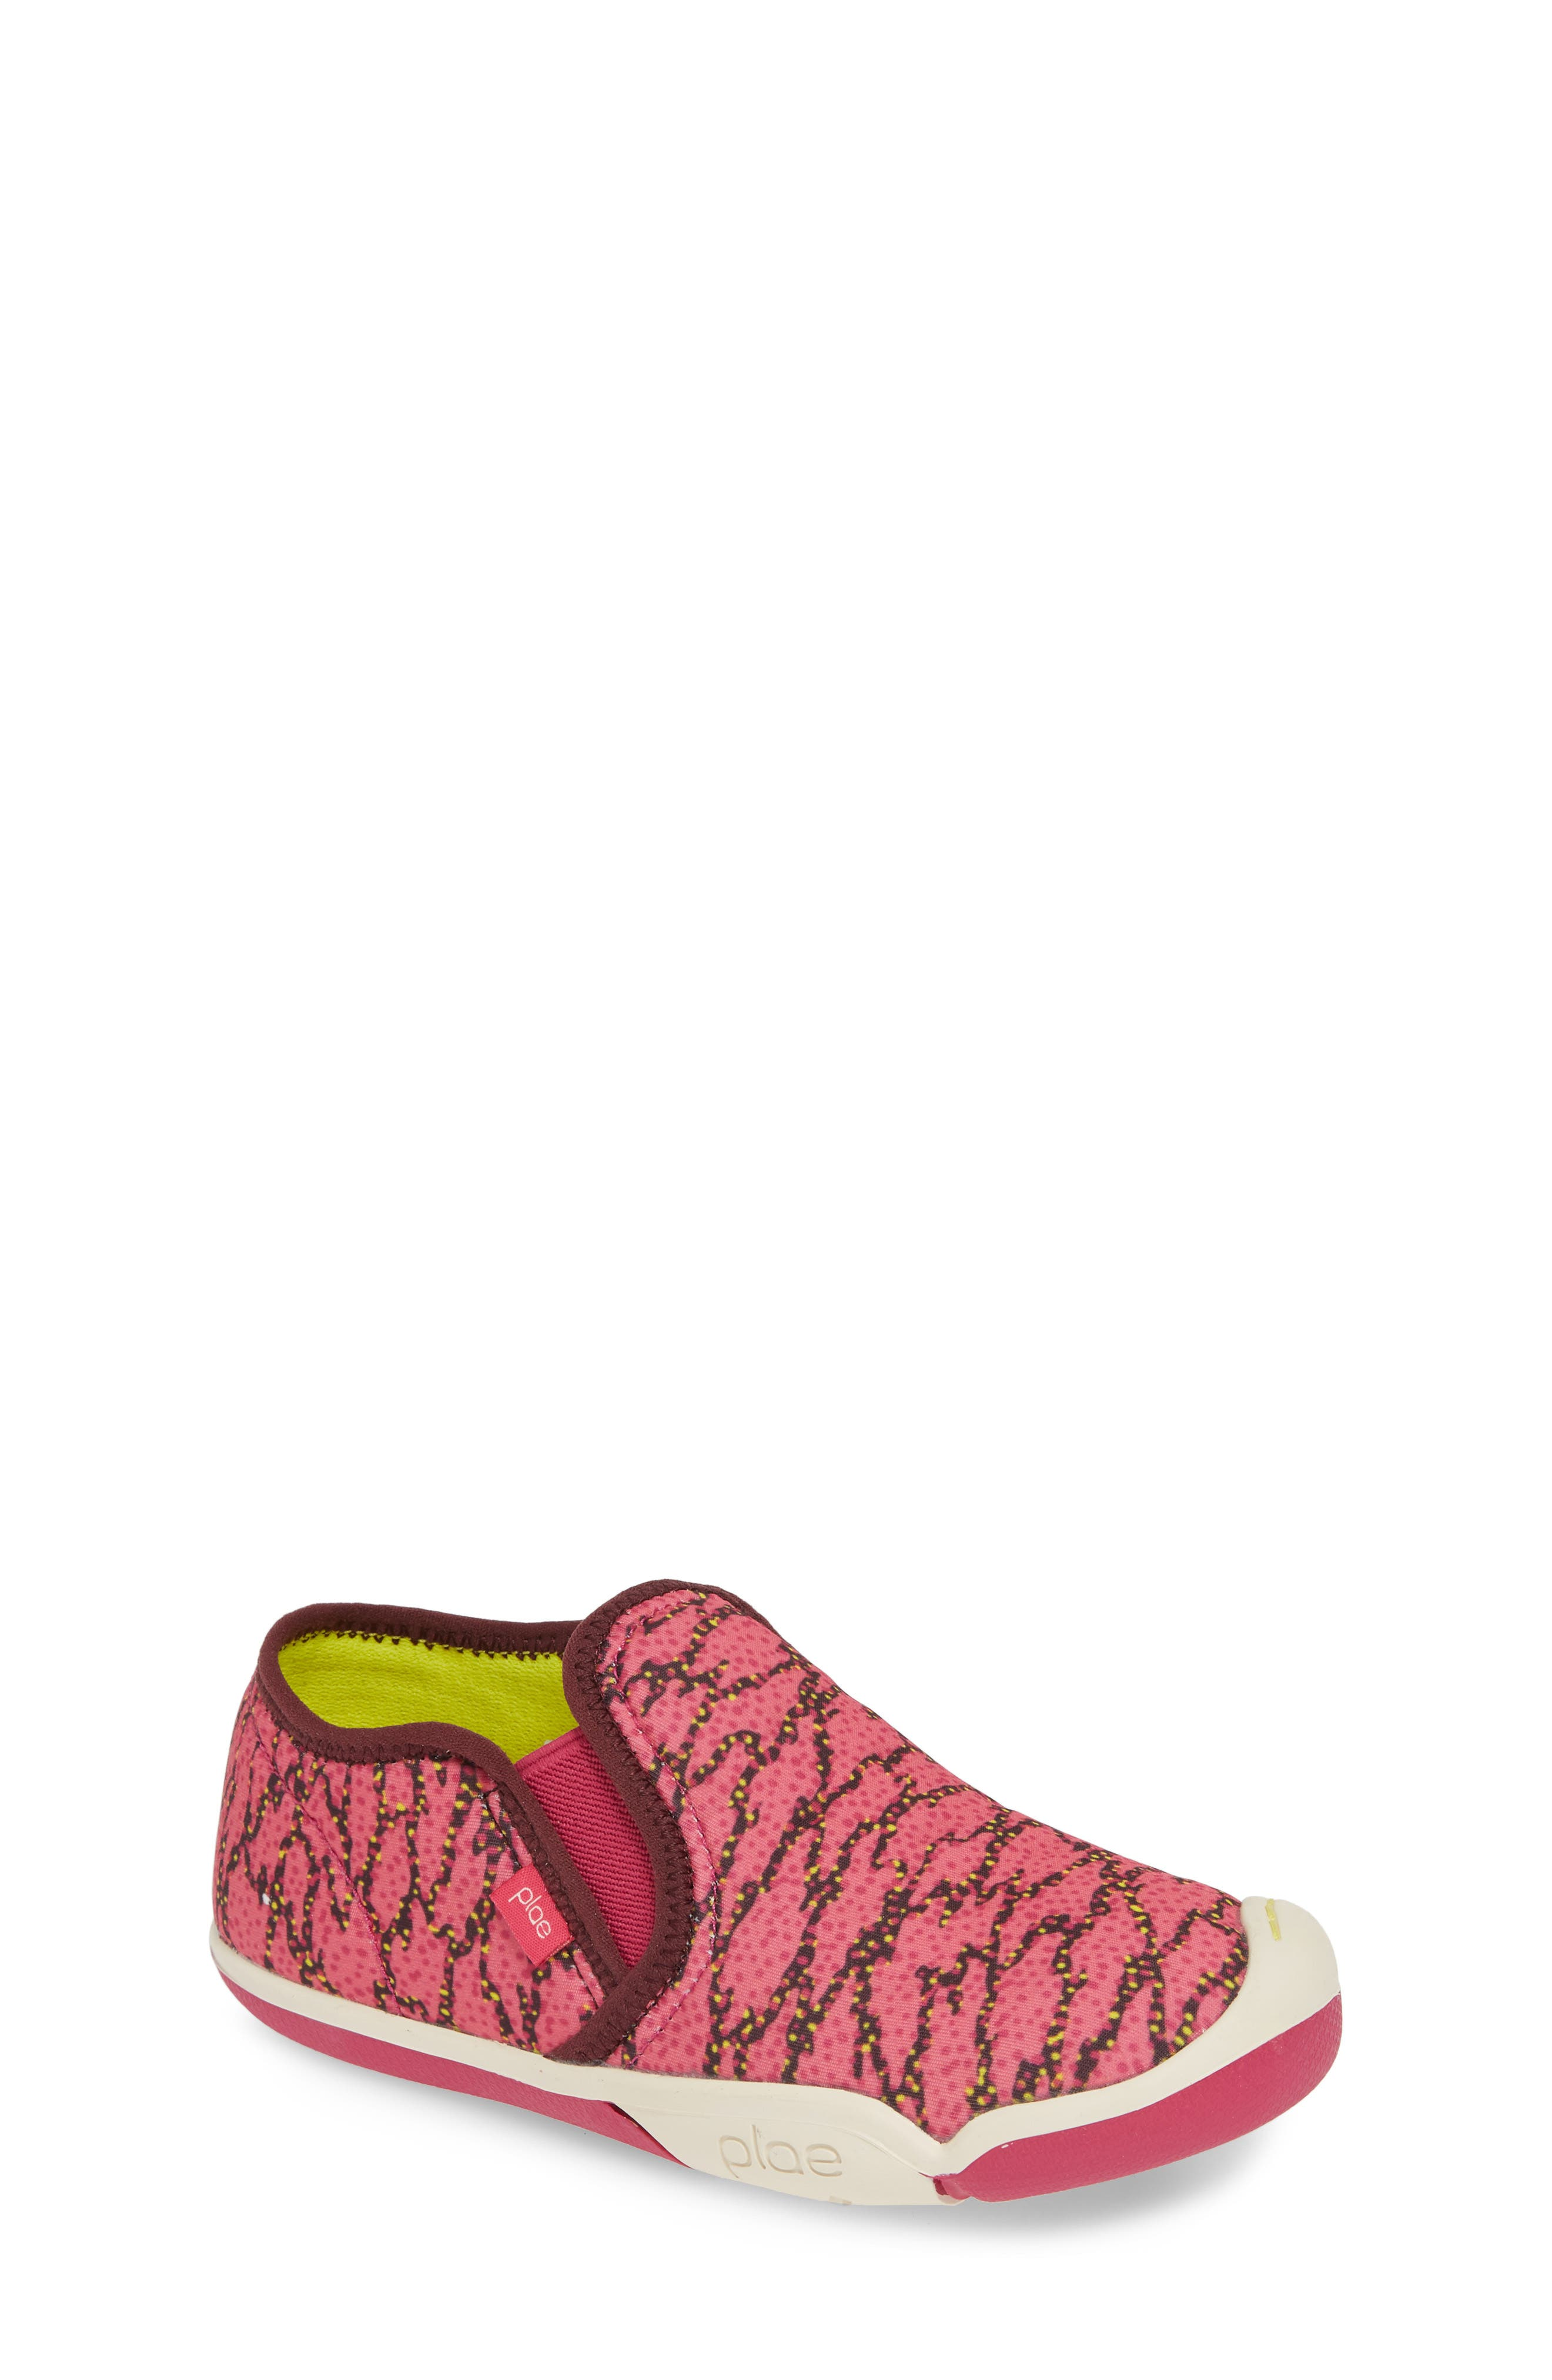 PLAE,                             Migi Slip-On Sneaker,                             Main thumbnail 1, color,                             ELECTRIC FUCHSIA SURGE